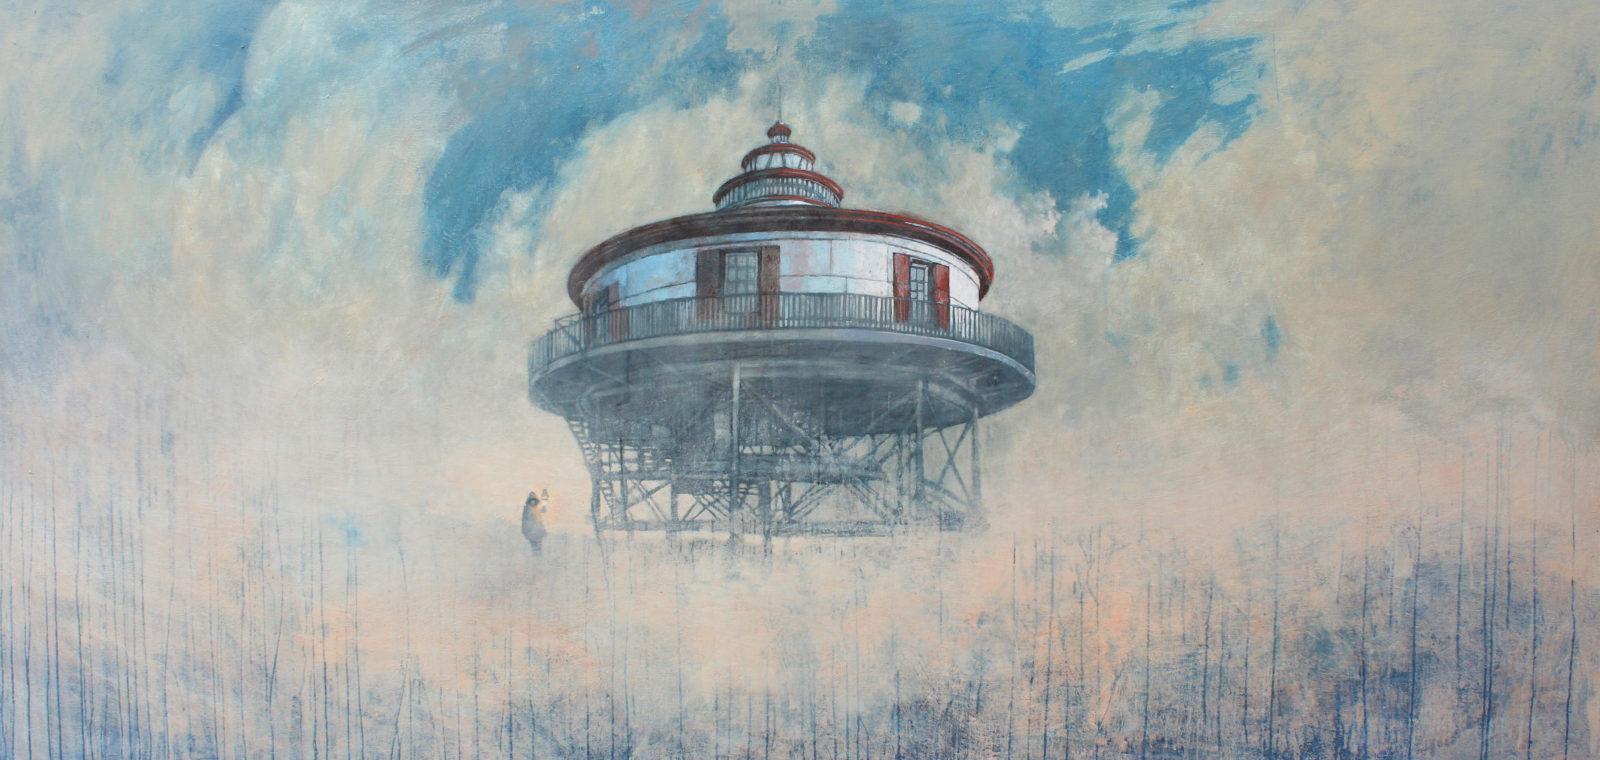 INFANTE FEDERICO, Toward the Sun, 2014, Acrilico su tela, 121x254 cm